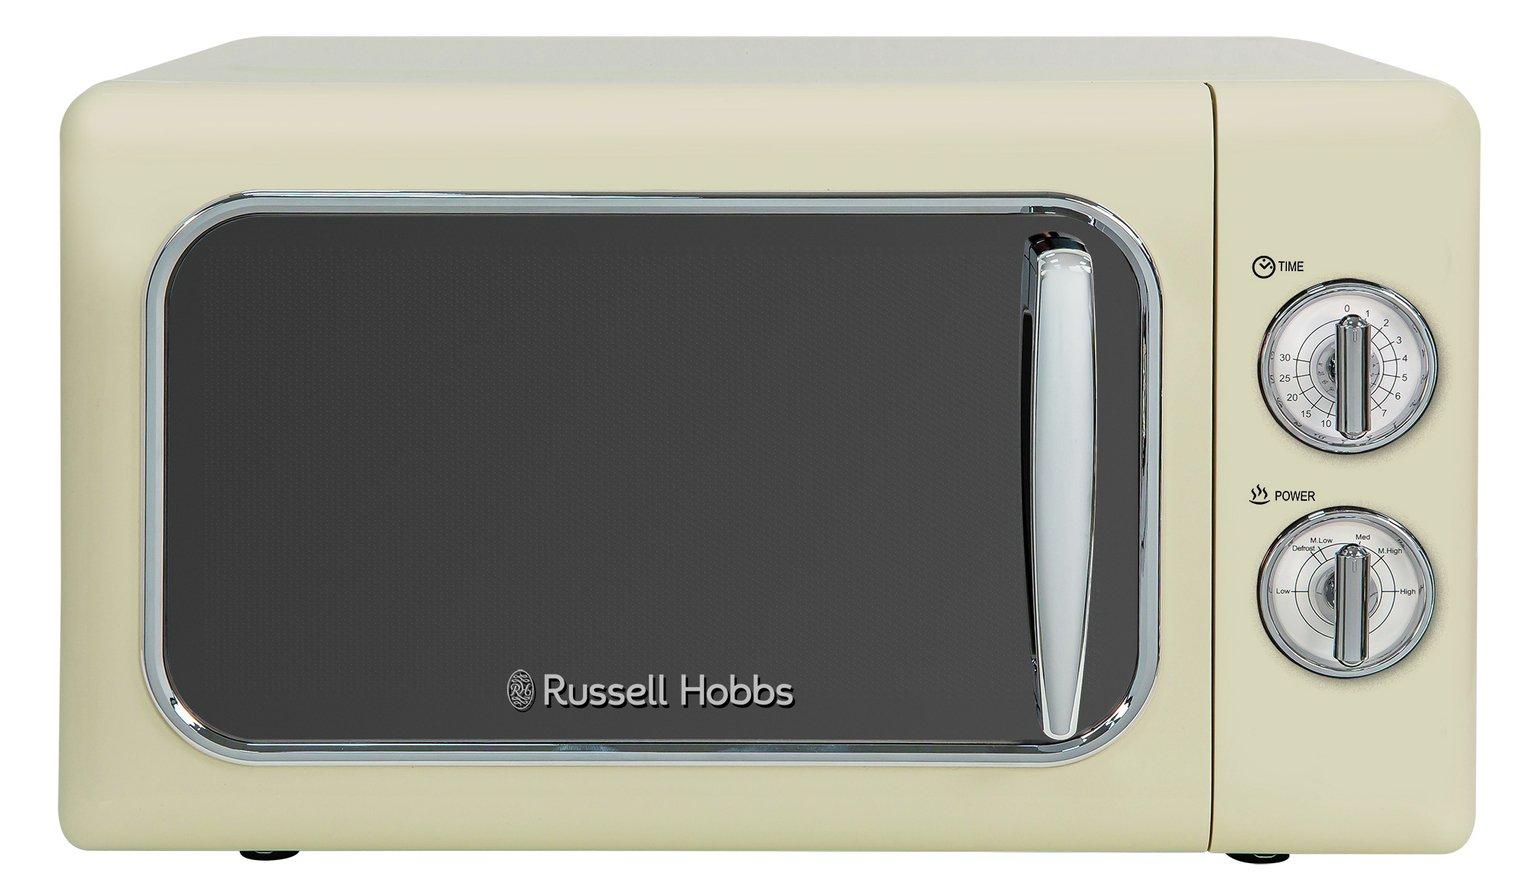 Russell Hobbs 700W Retro Standard Microwave RHMM717C - Cream